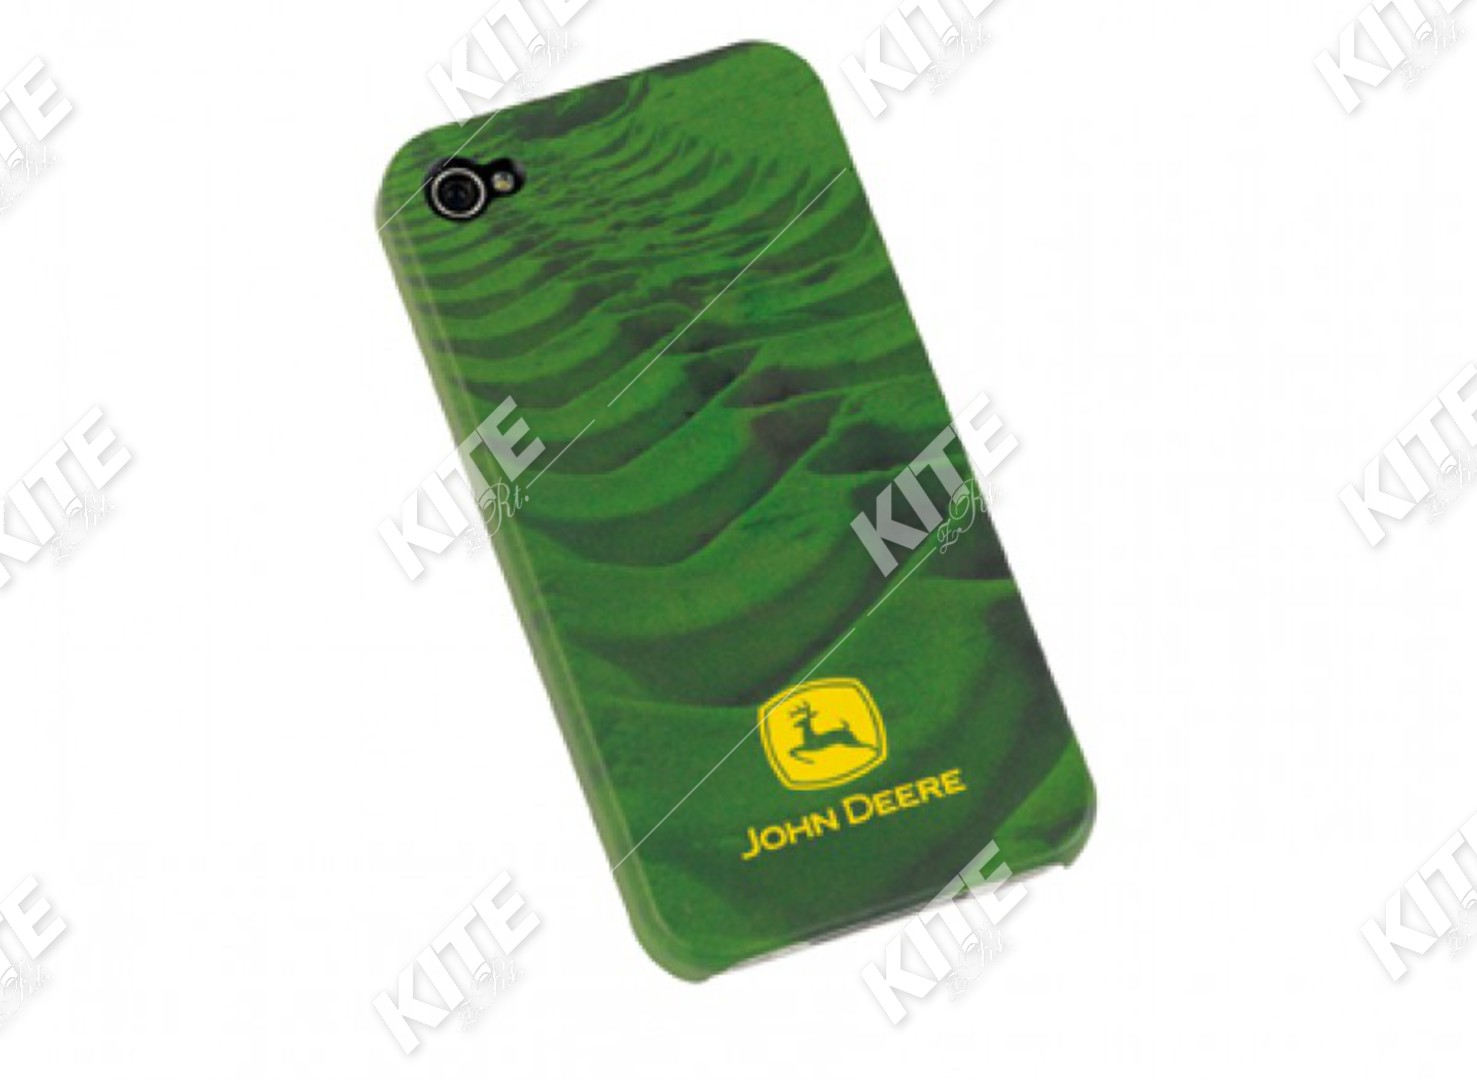 John Deere telefontok (iPhone 4/4S)